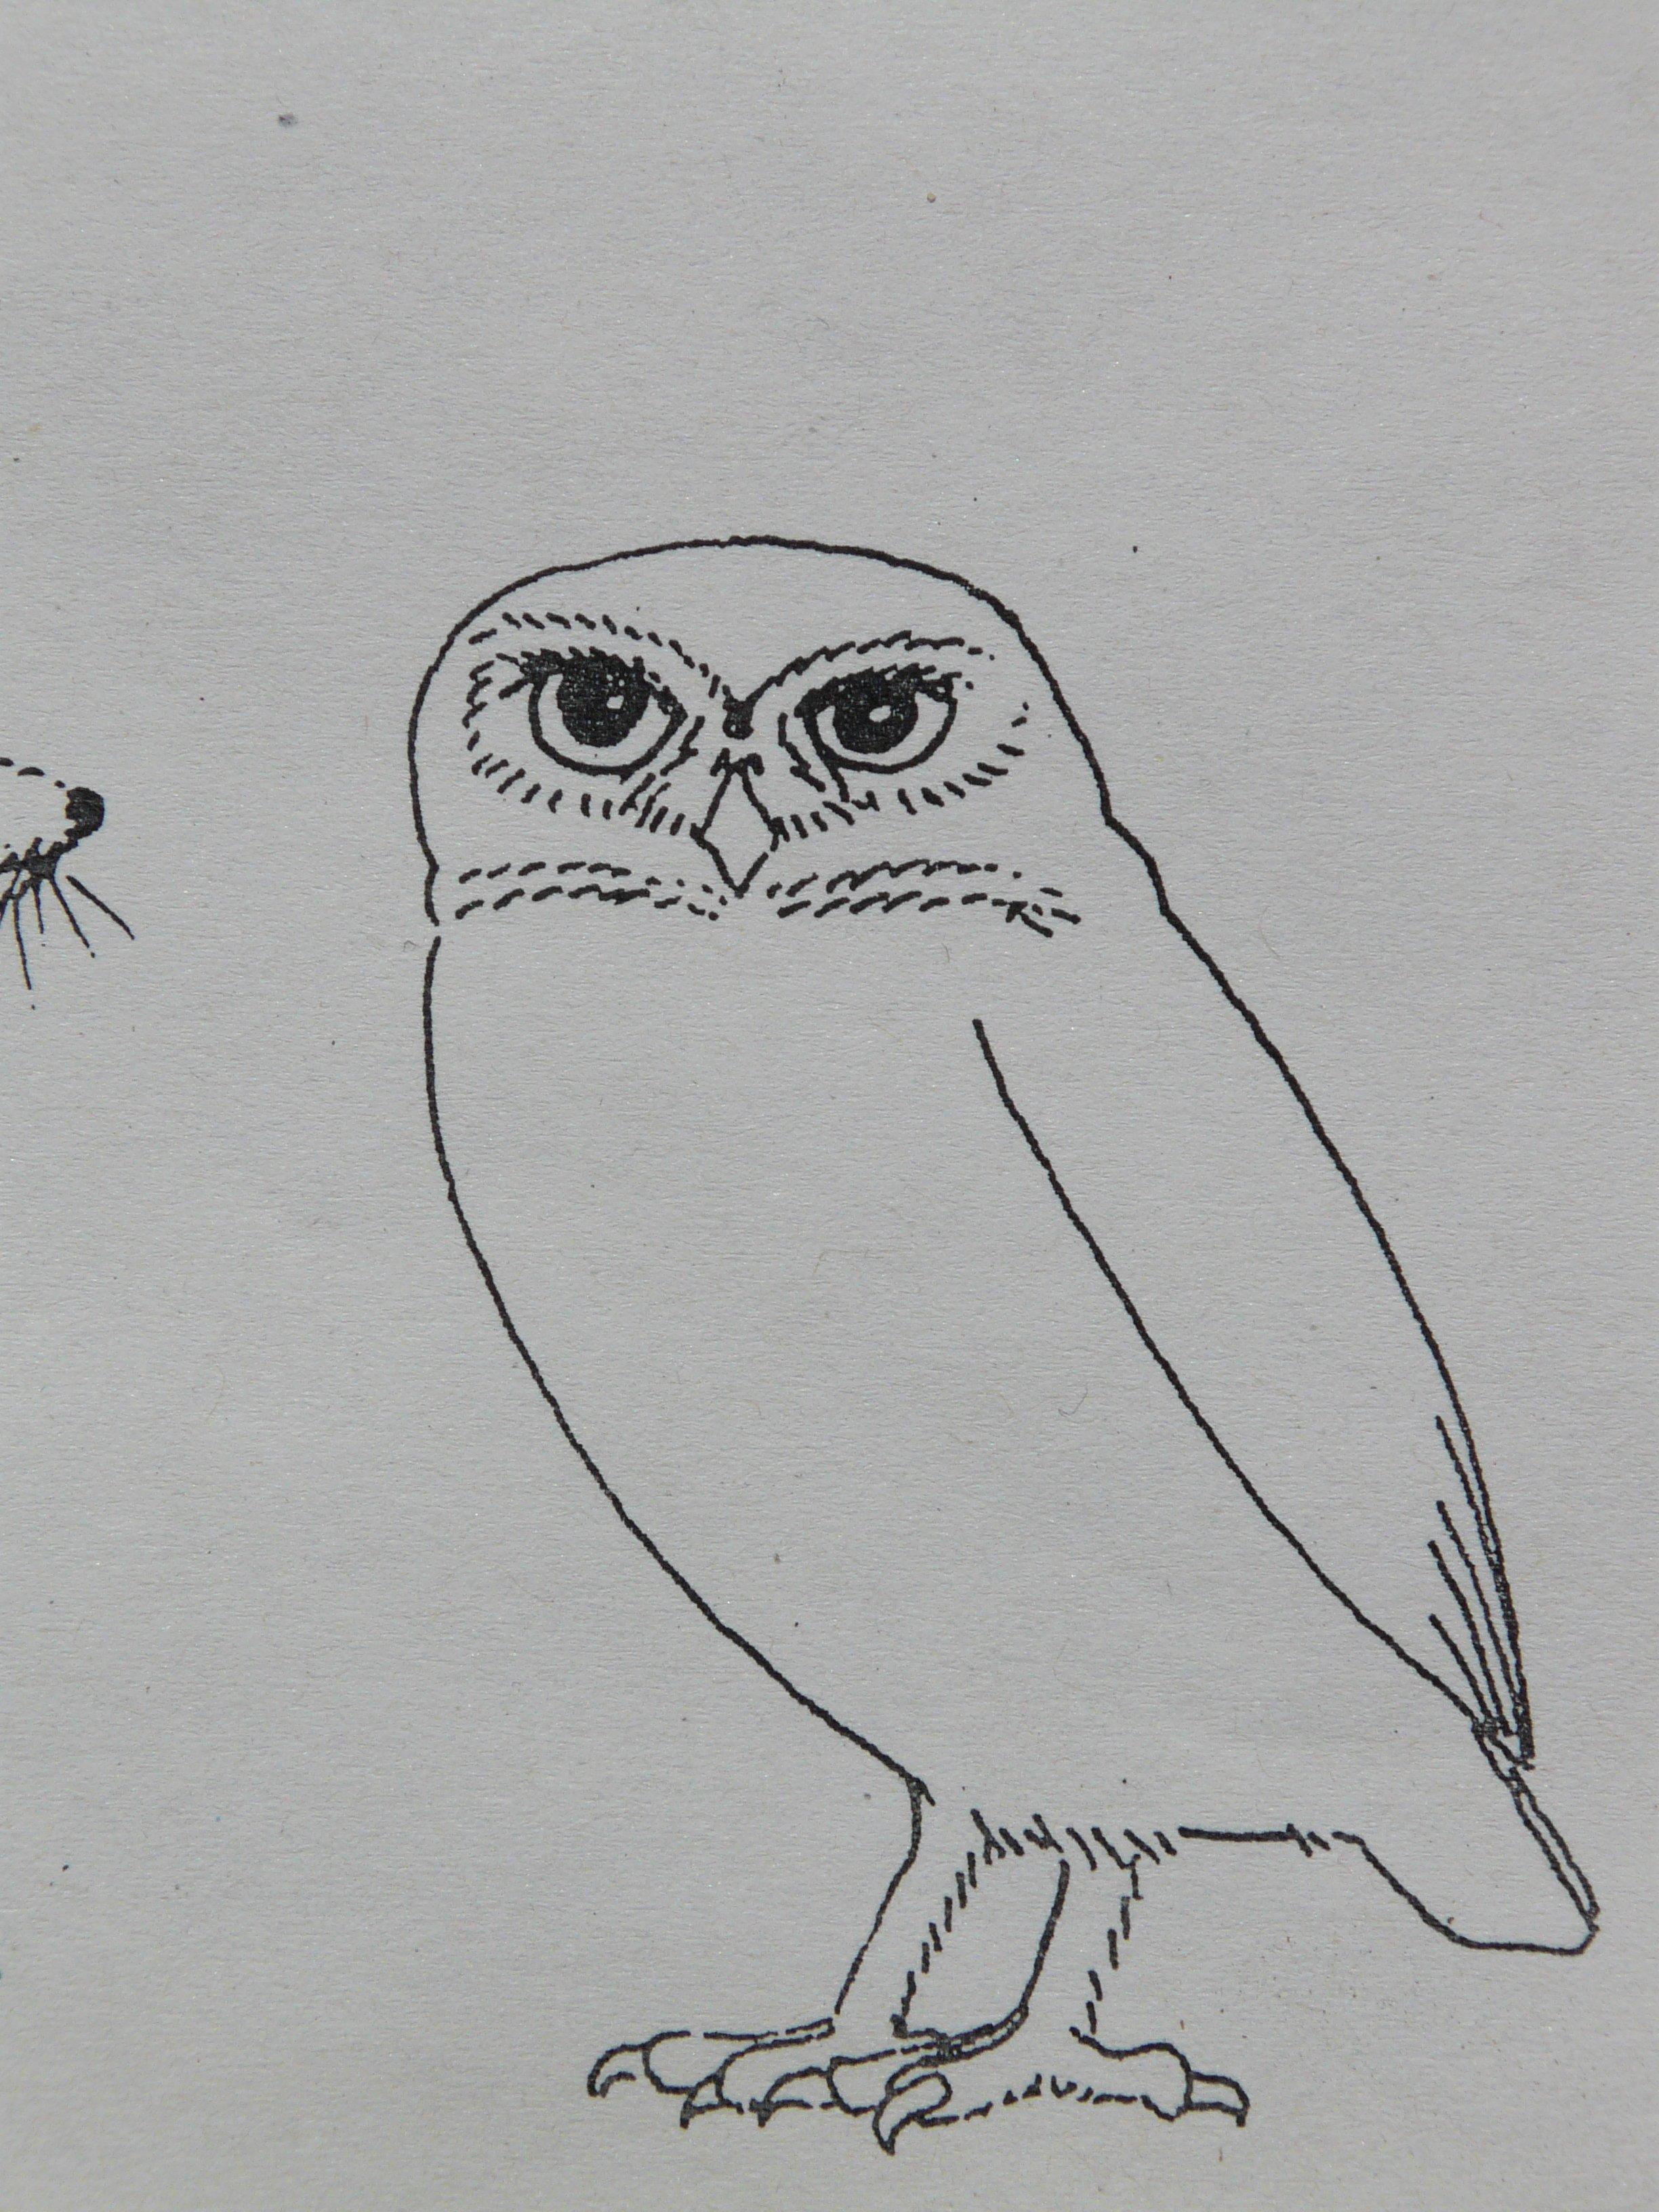 Fotos gratis : pájaro, ala, animal, pintar, búho, ave de rapiña ...